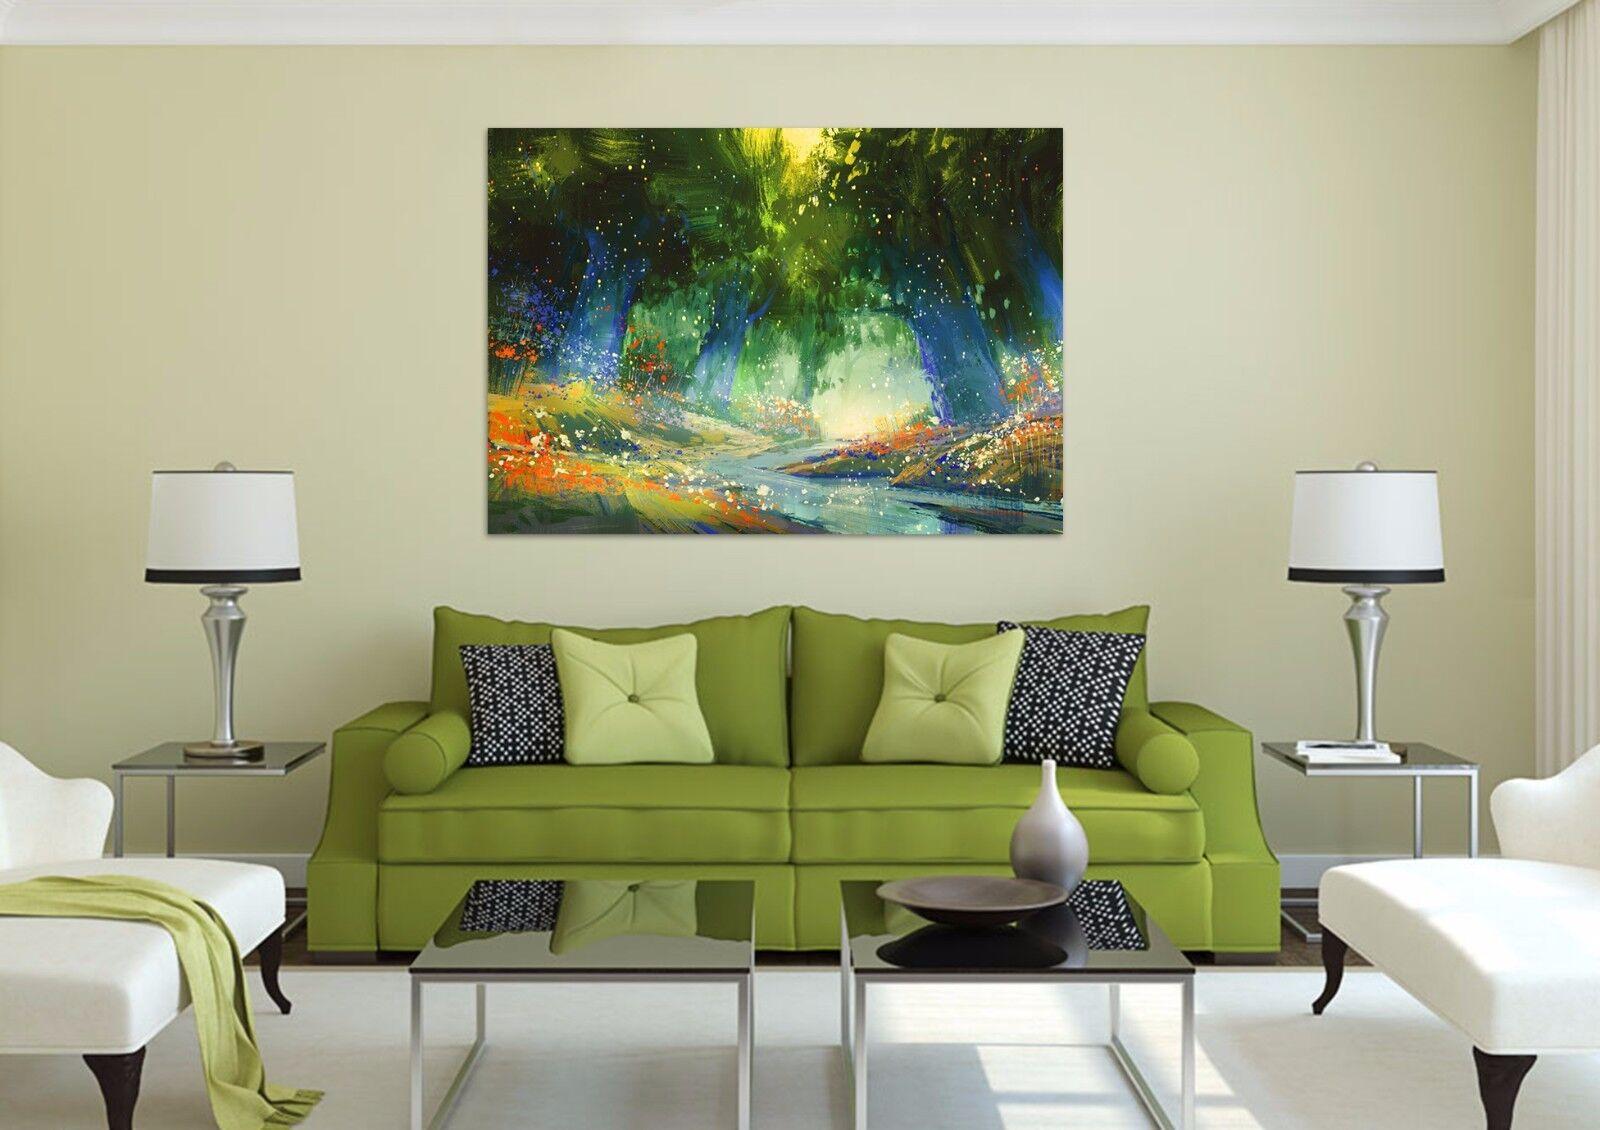 3D Firefly Wald Fluss  Bild 8445 Fototapeten Wandbild BildTapete AJSTORE DE Lemo | Verbraucher zuerst  | ein guter Ruf in der Welt  | Kaufen Sie online